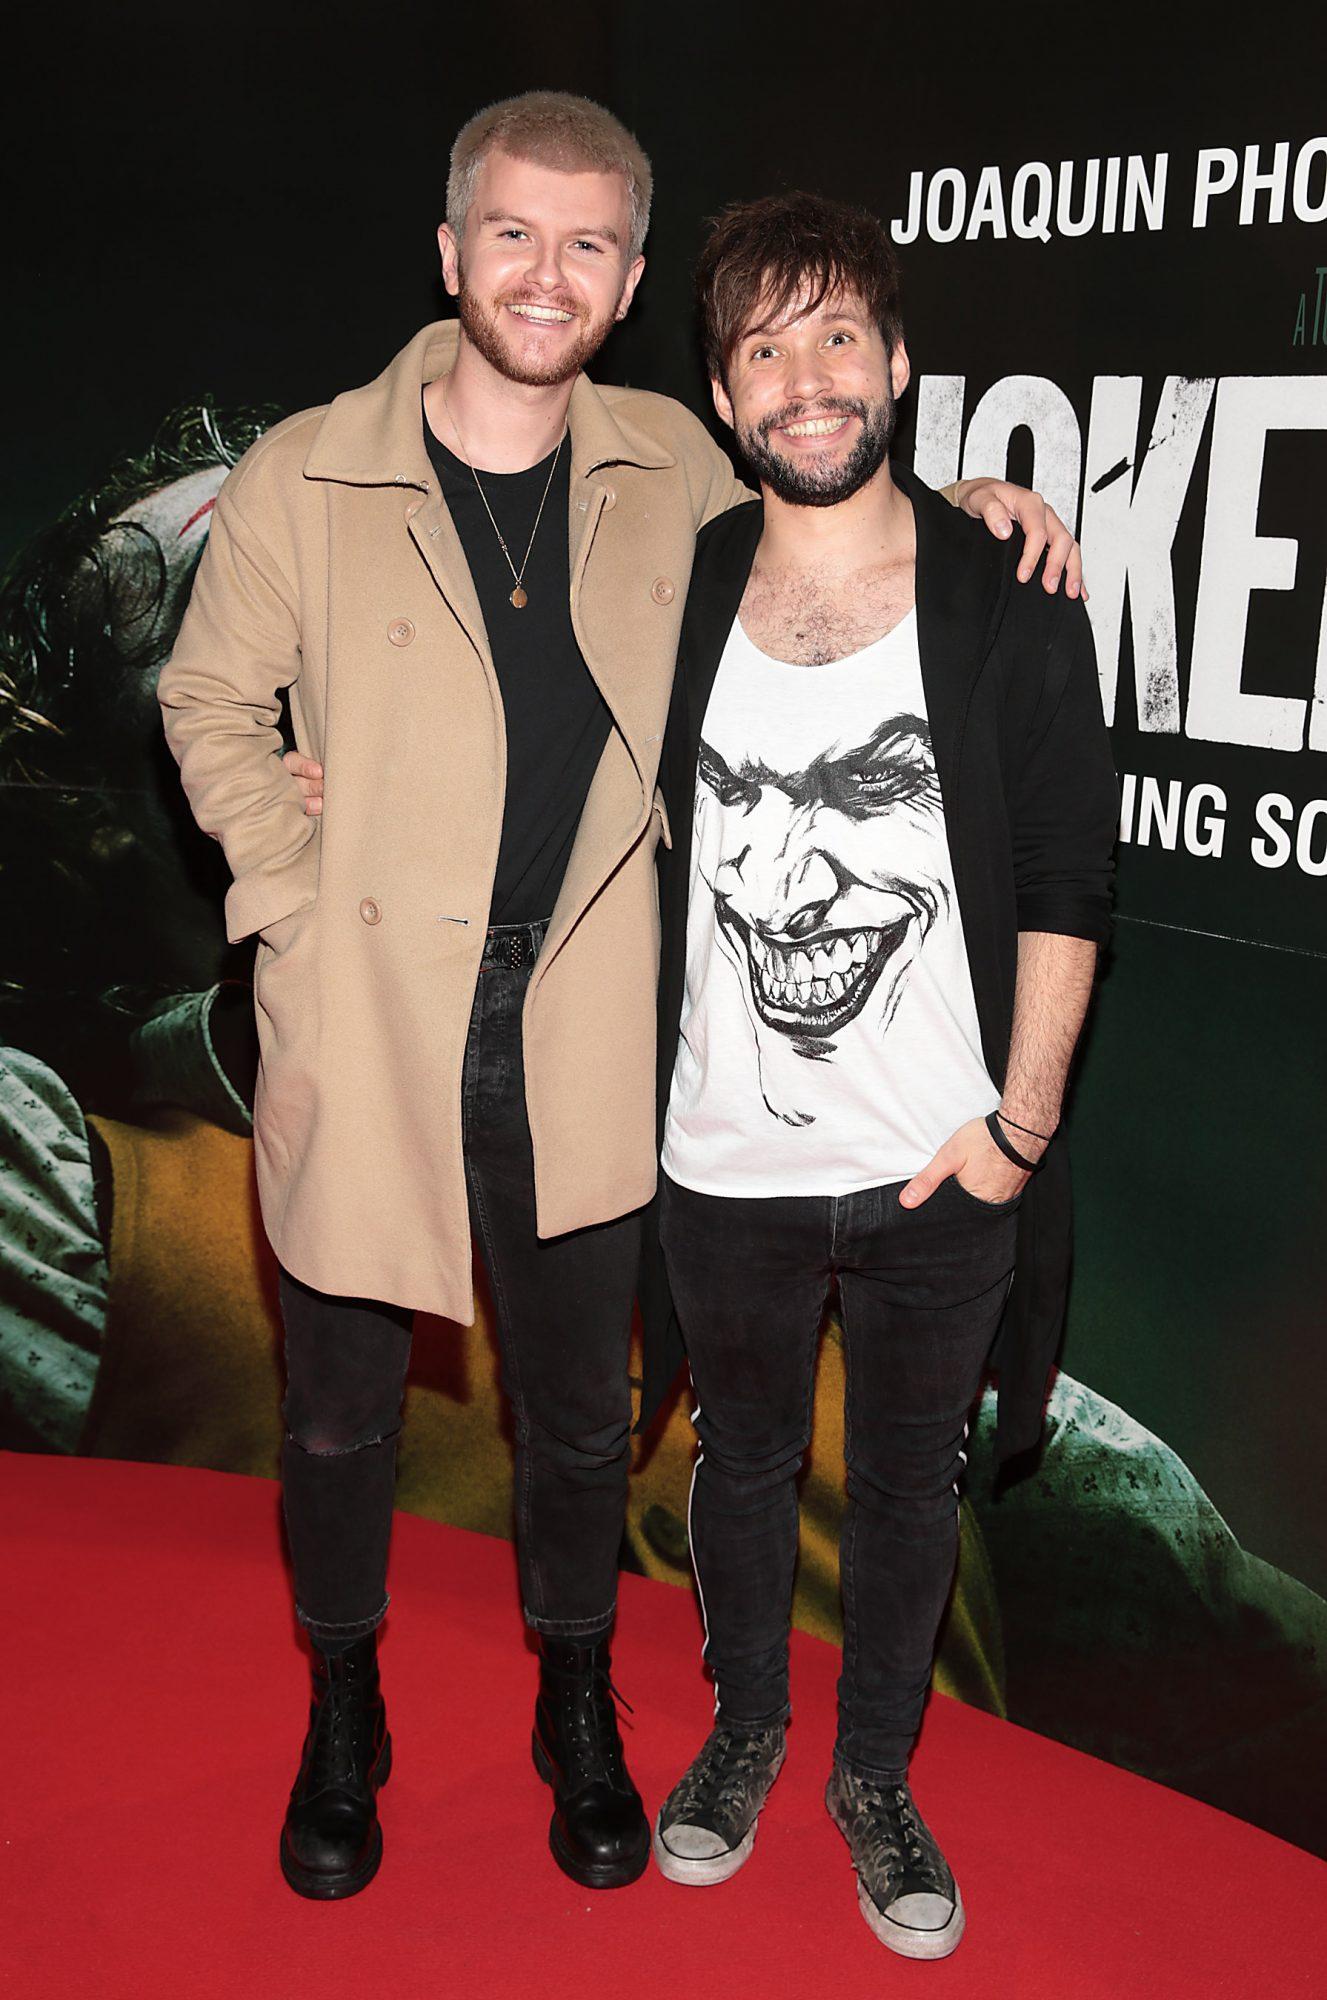 Calum McAdam and David Whelan of Wild Youth at the Irish Premiere screening of TJoker at Cineworld, Dublin. Pic: Brian McEvoy.